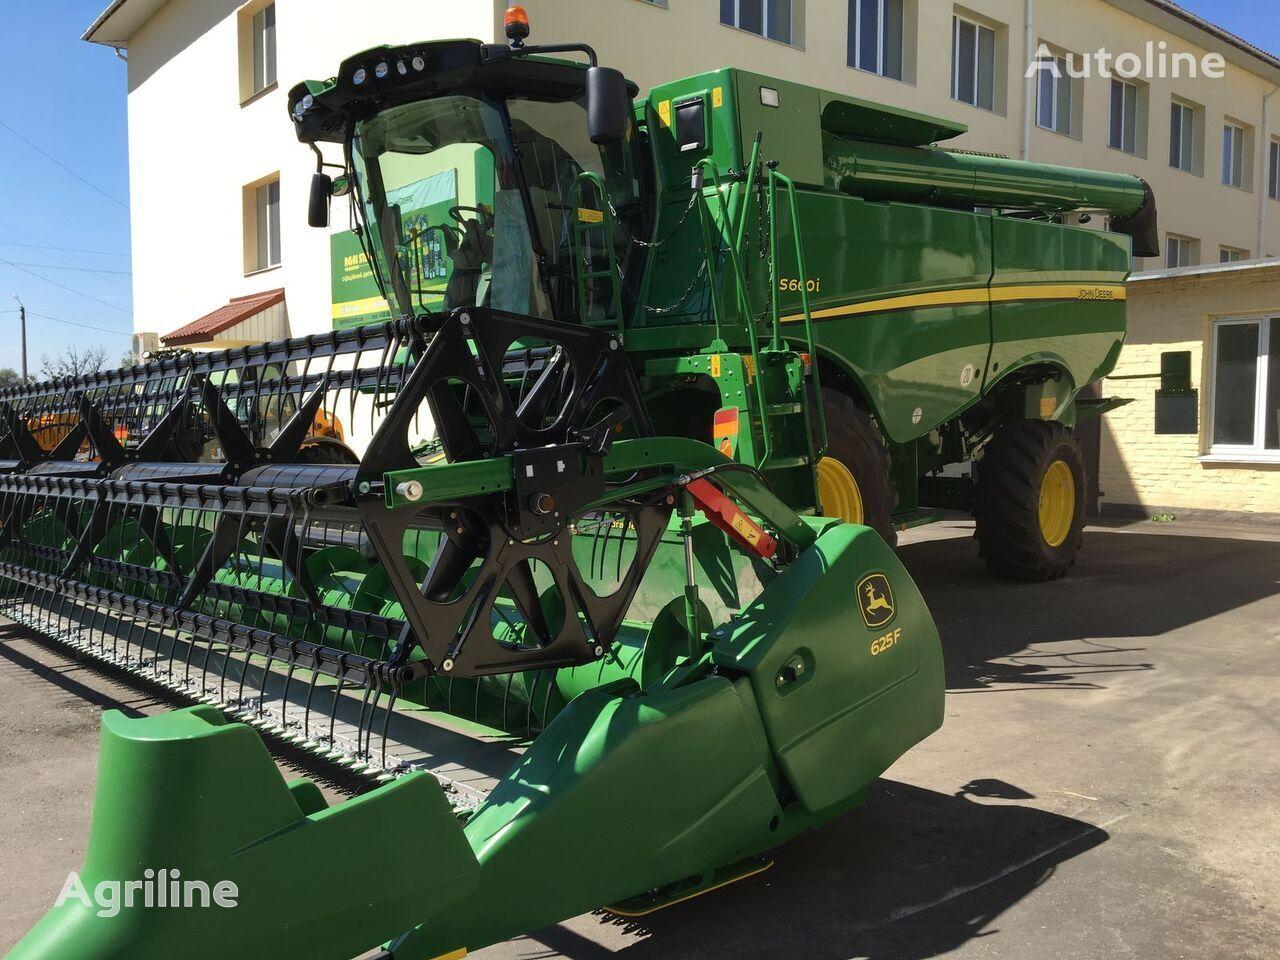 JOHN DEERE S660 forage harvester